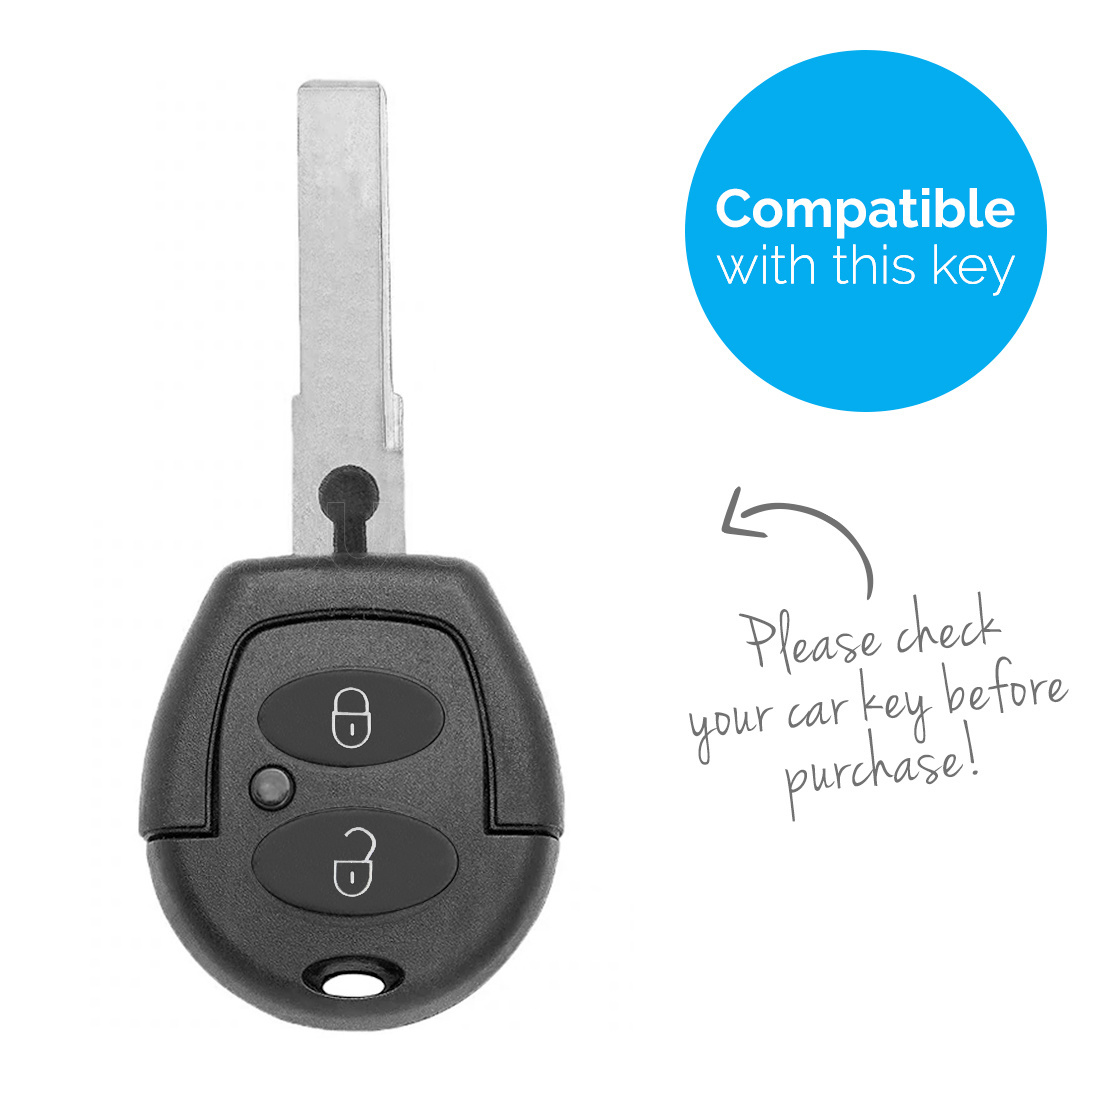 TBU car TBU car Autoschlüssel Hülle kompatibel mit Skoda 2 Tasten - Schutzhülle aus Silikon - Auto Schlüsselhülle Cover in Weiß